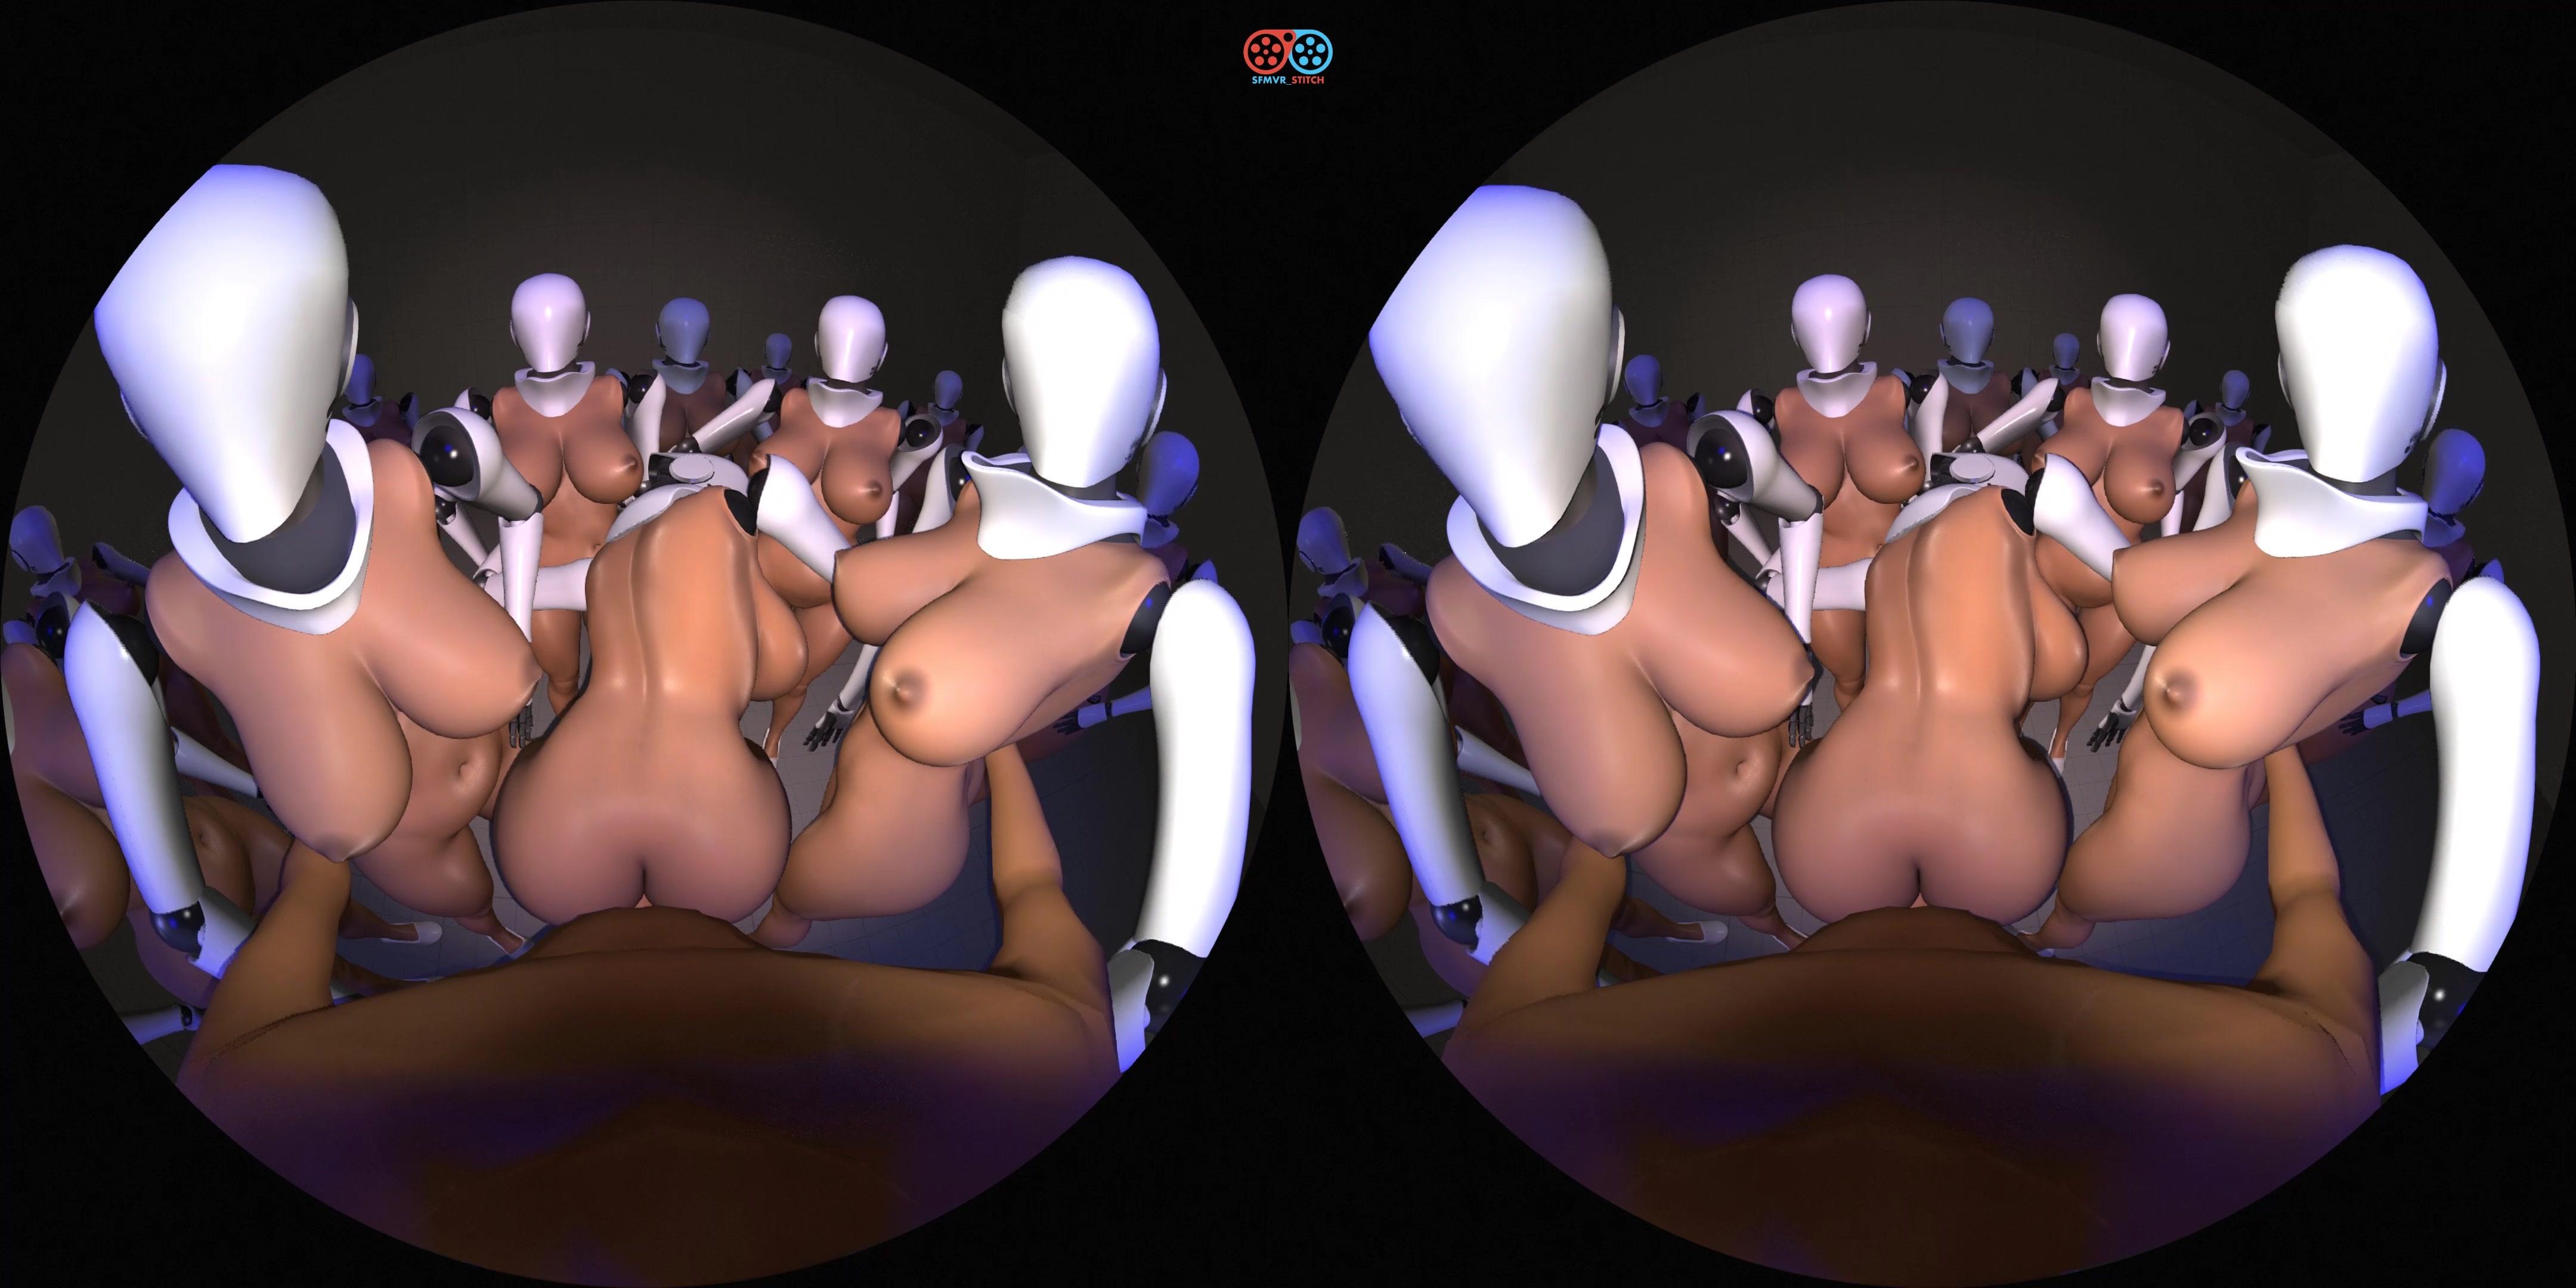 sfm vr porn